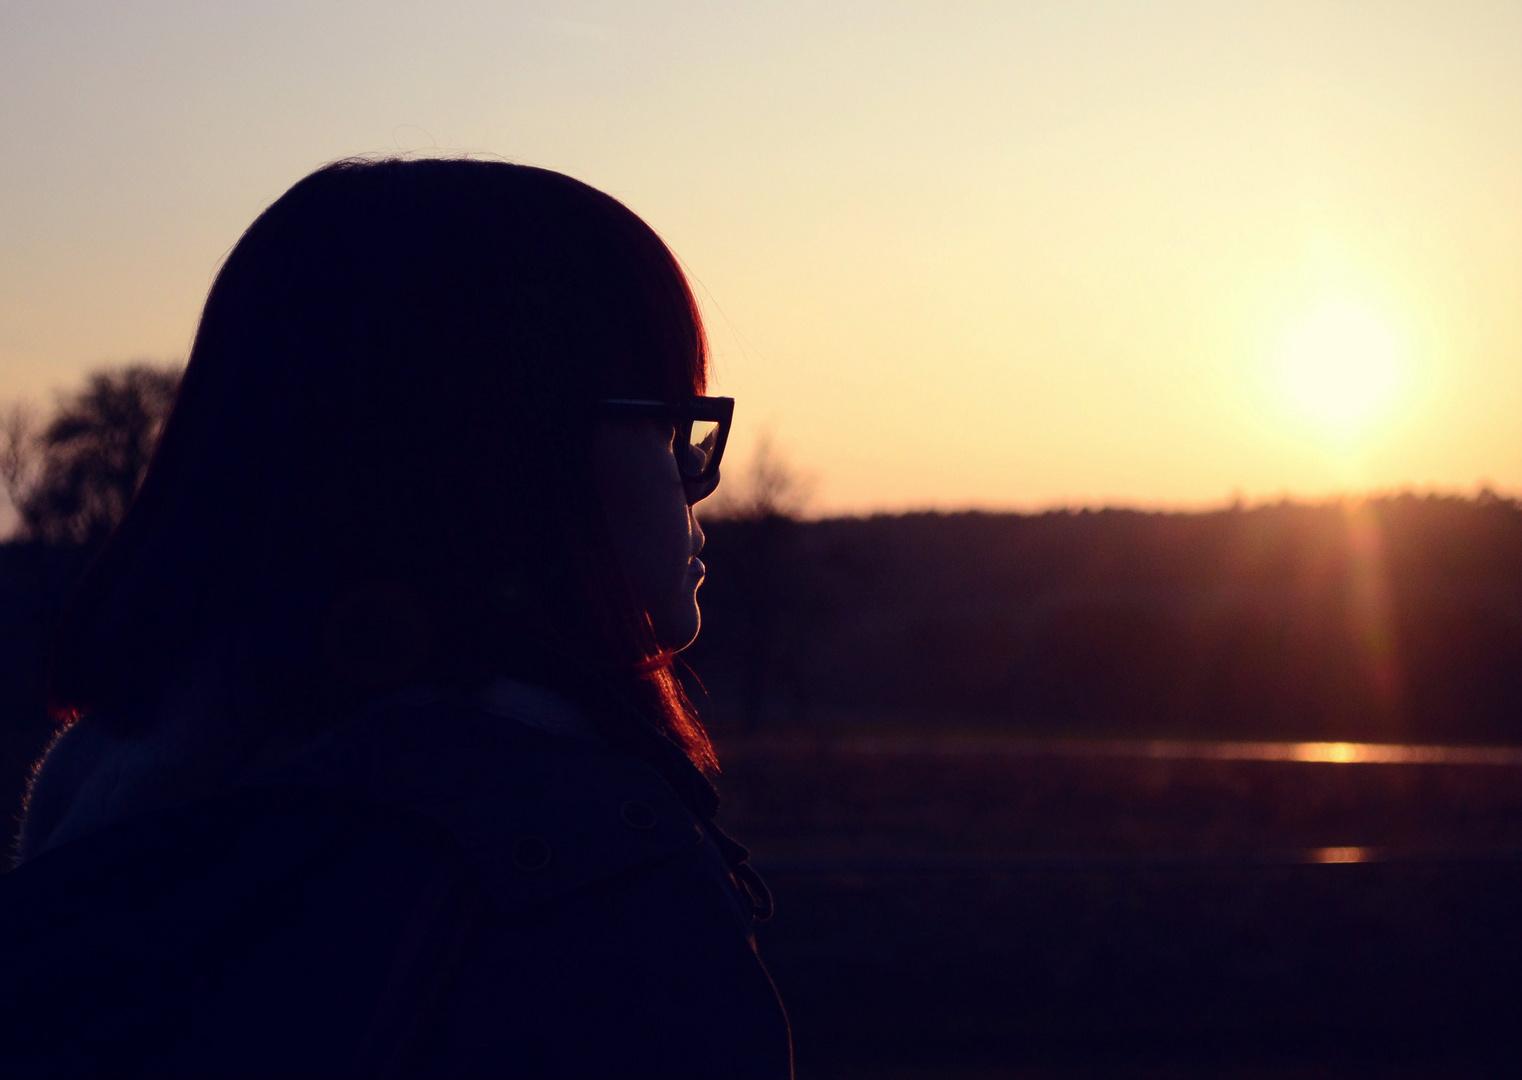 Sonnenuntergangsstimmung :)